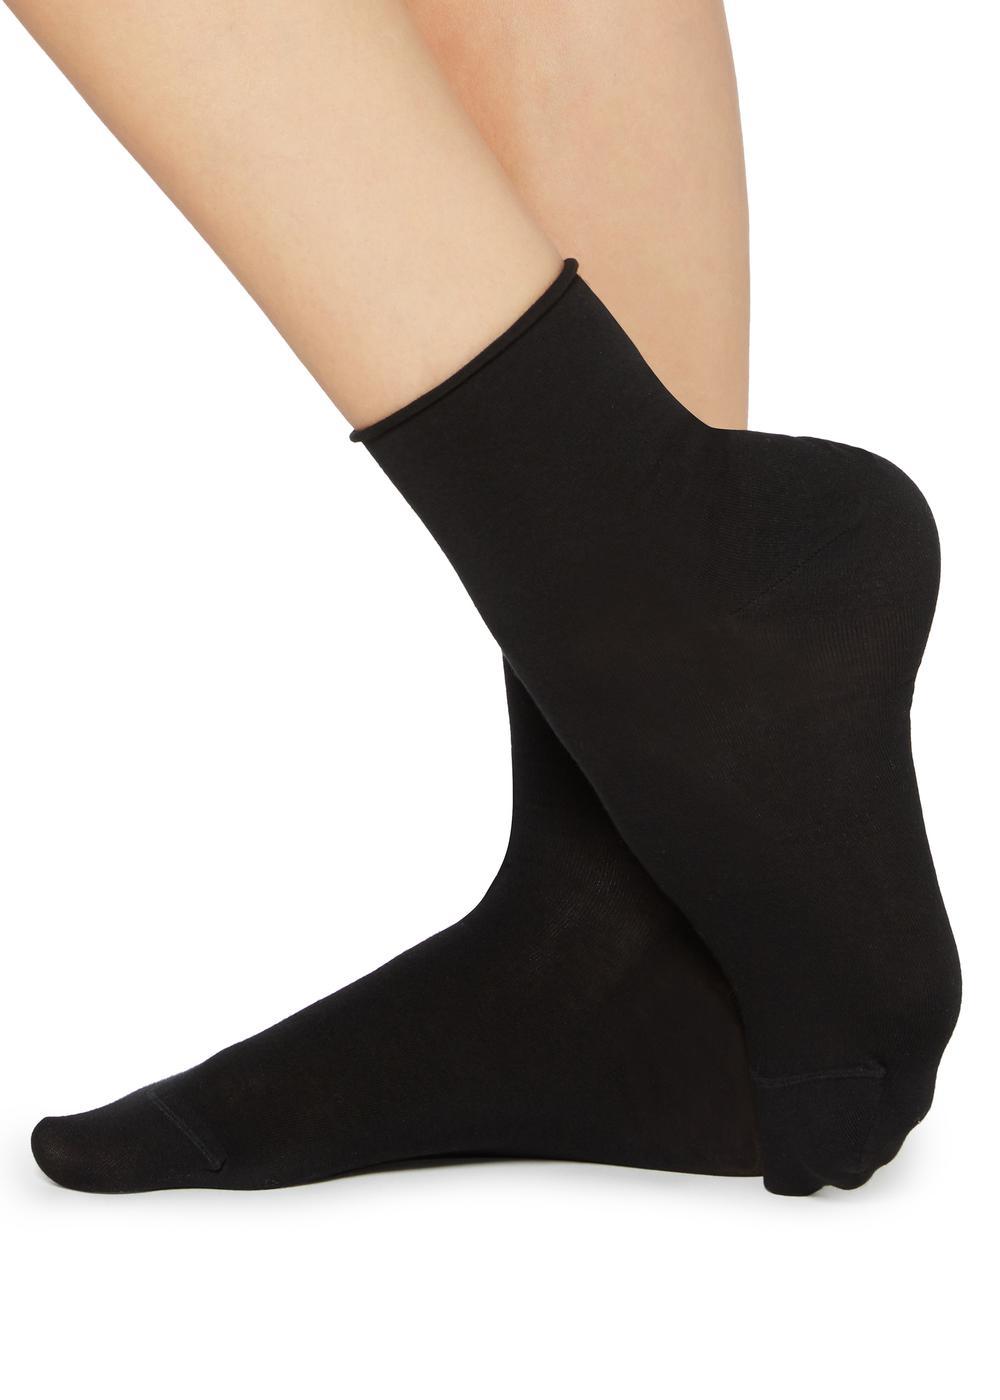 Light Cotton Socks With Comfort Cuff